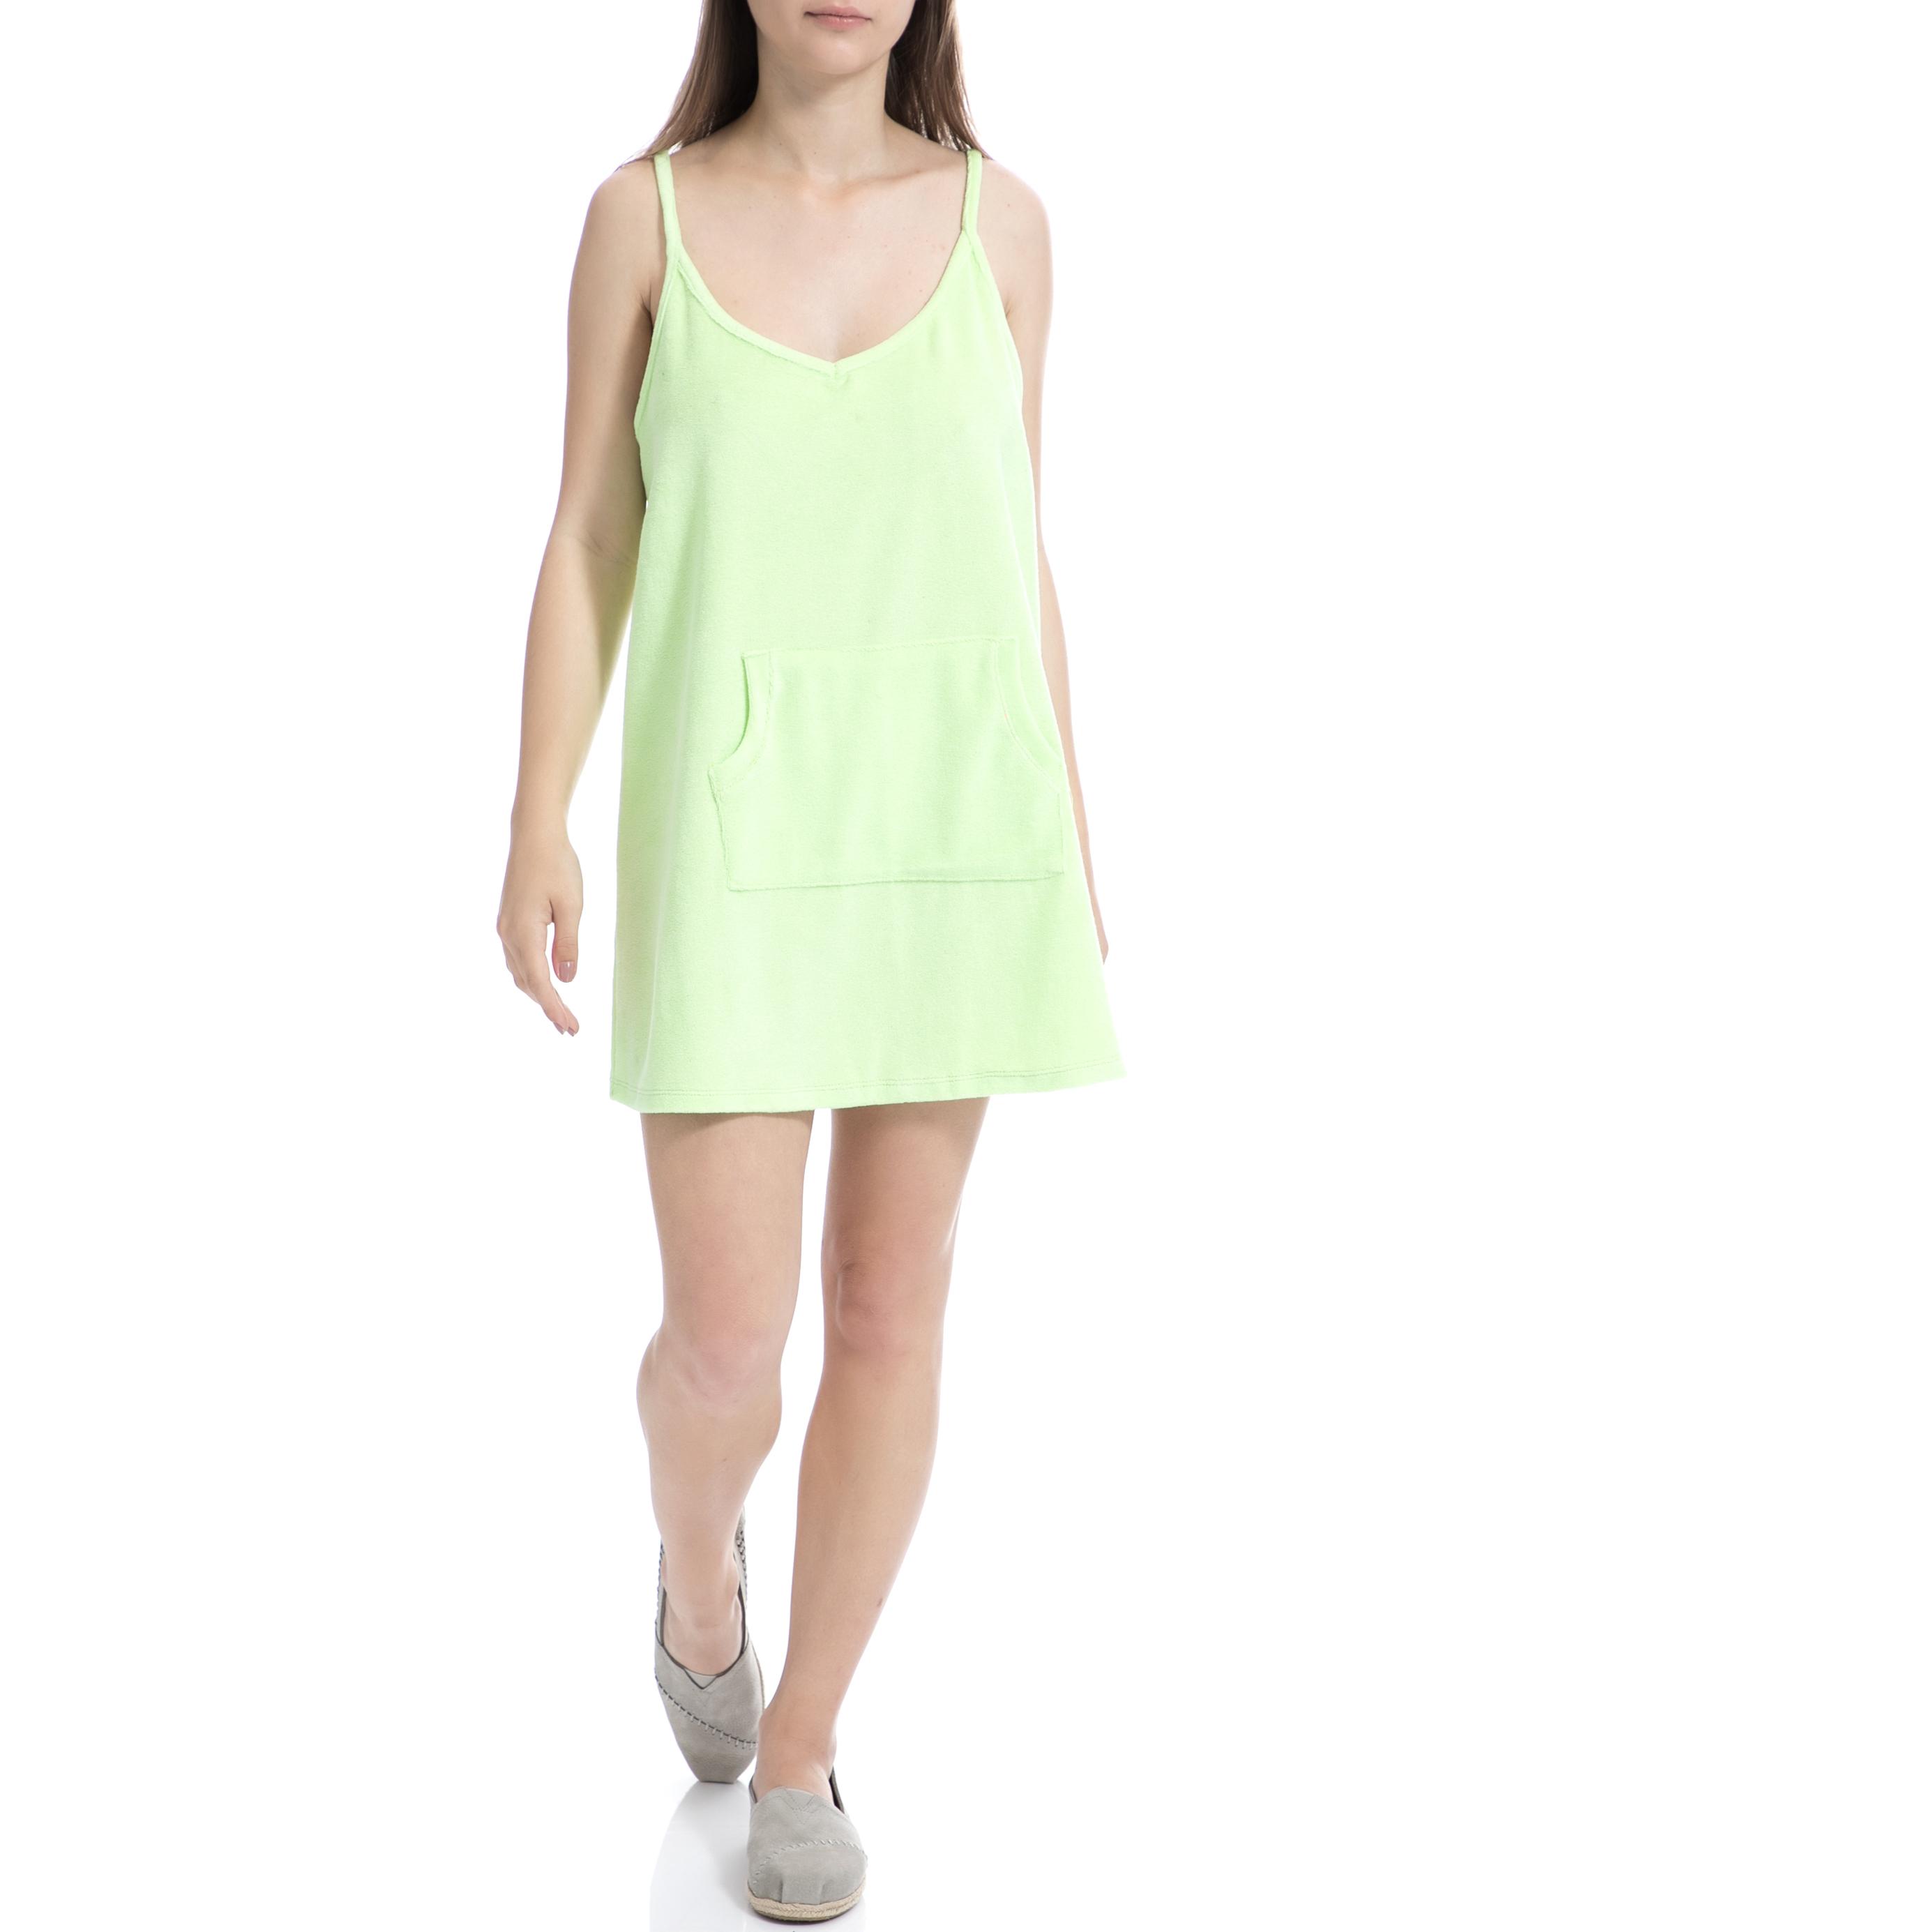 MYMOO - Γυναικείο φόρεμα MYMOO πράσινο γυναικεία ρούχα φορέματα μίνι